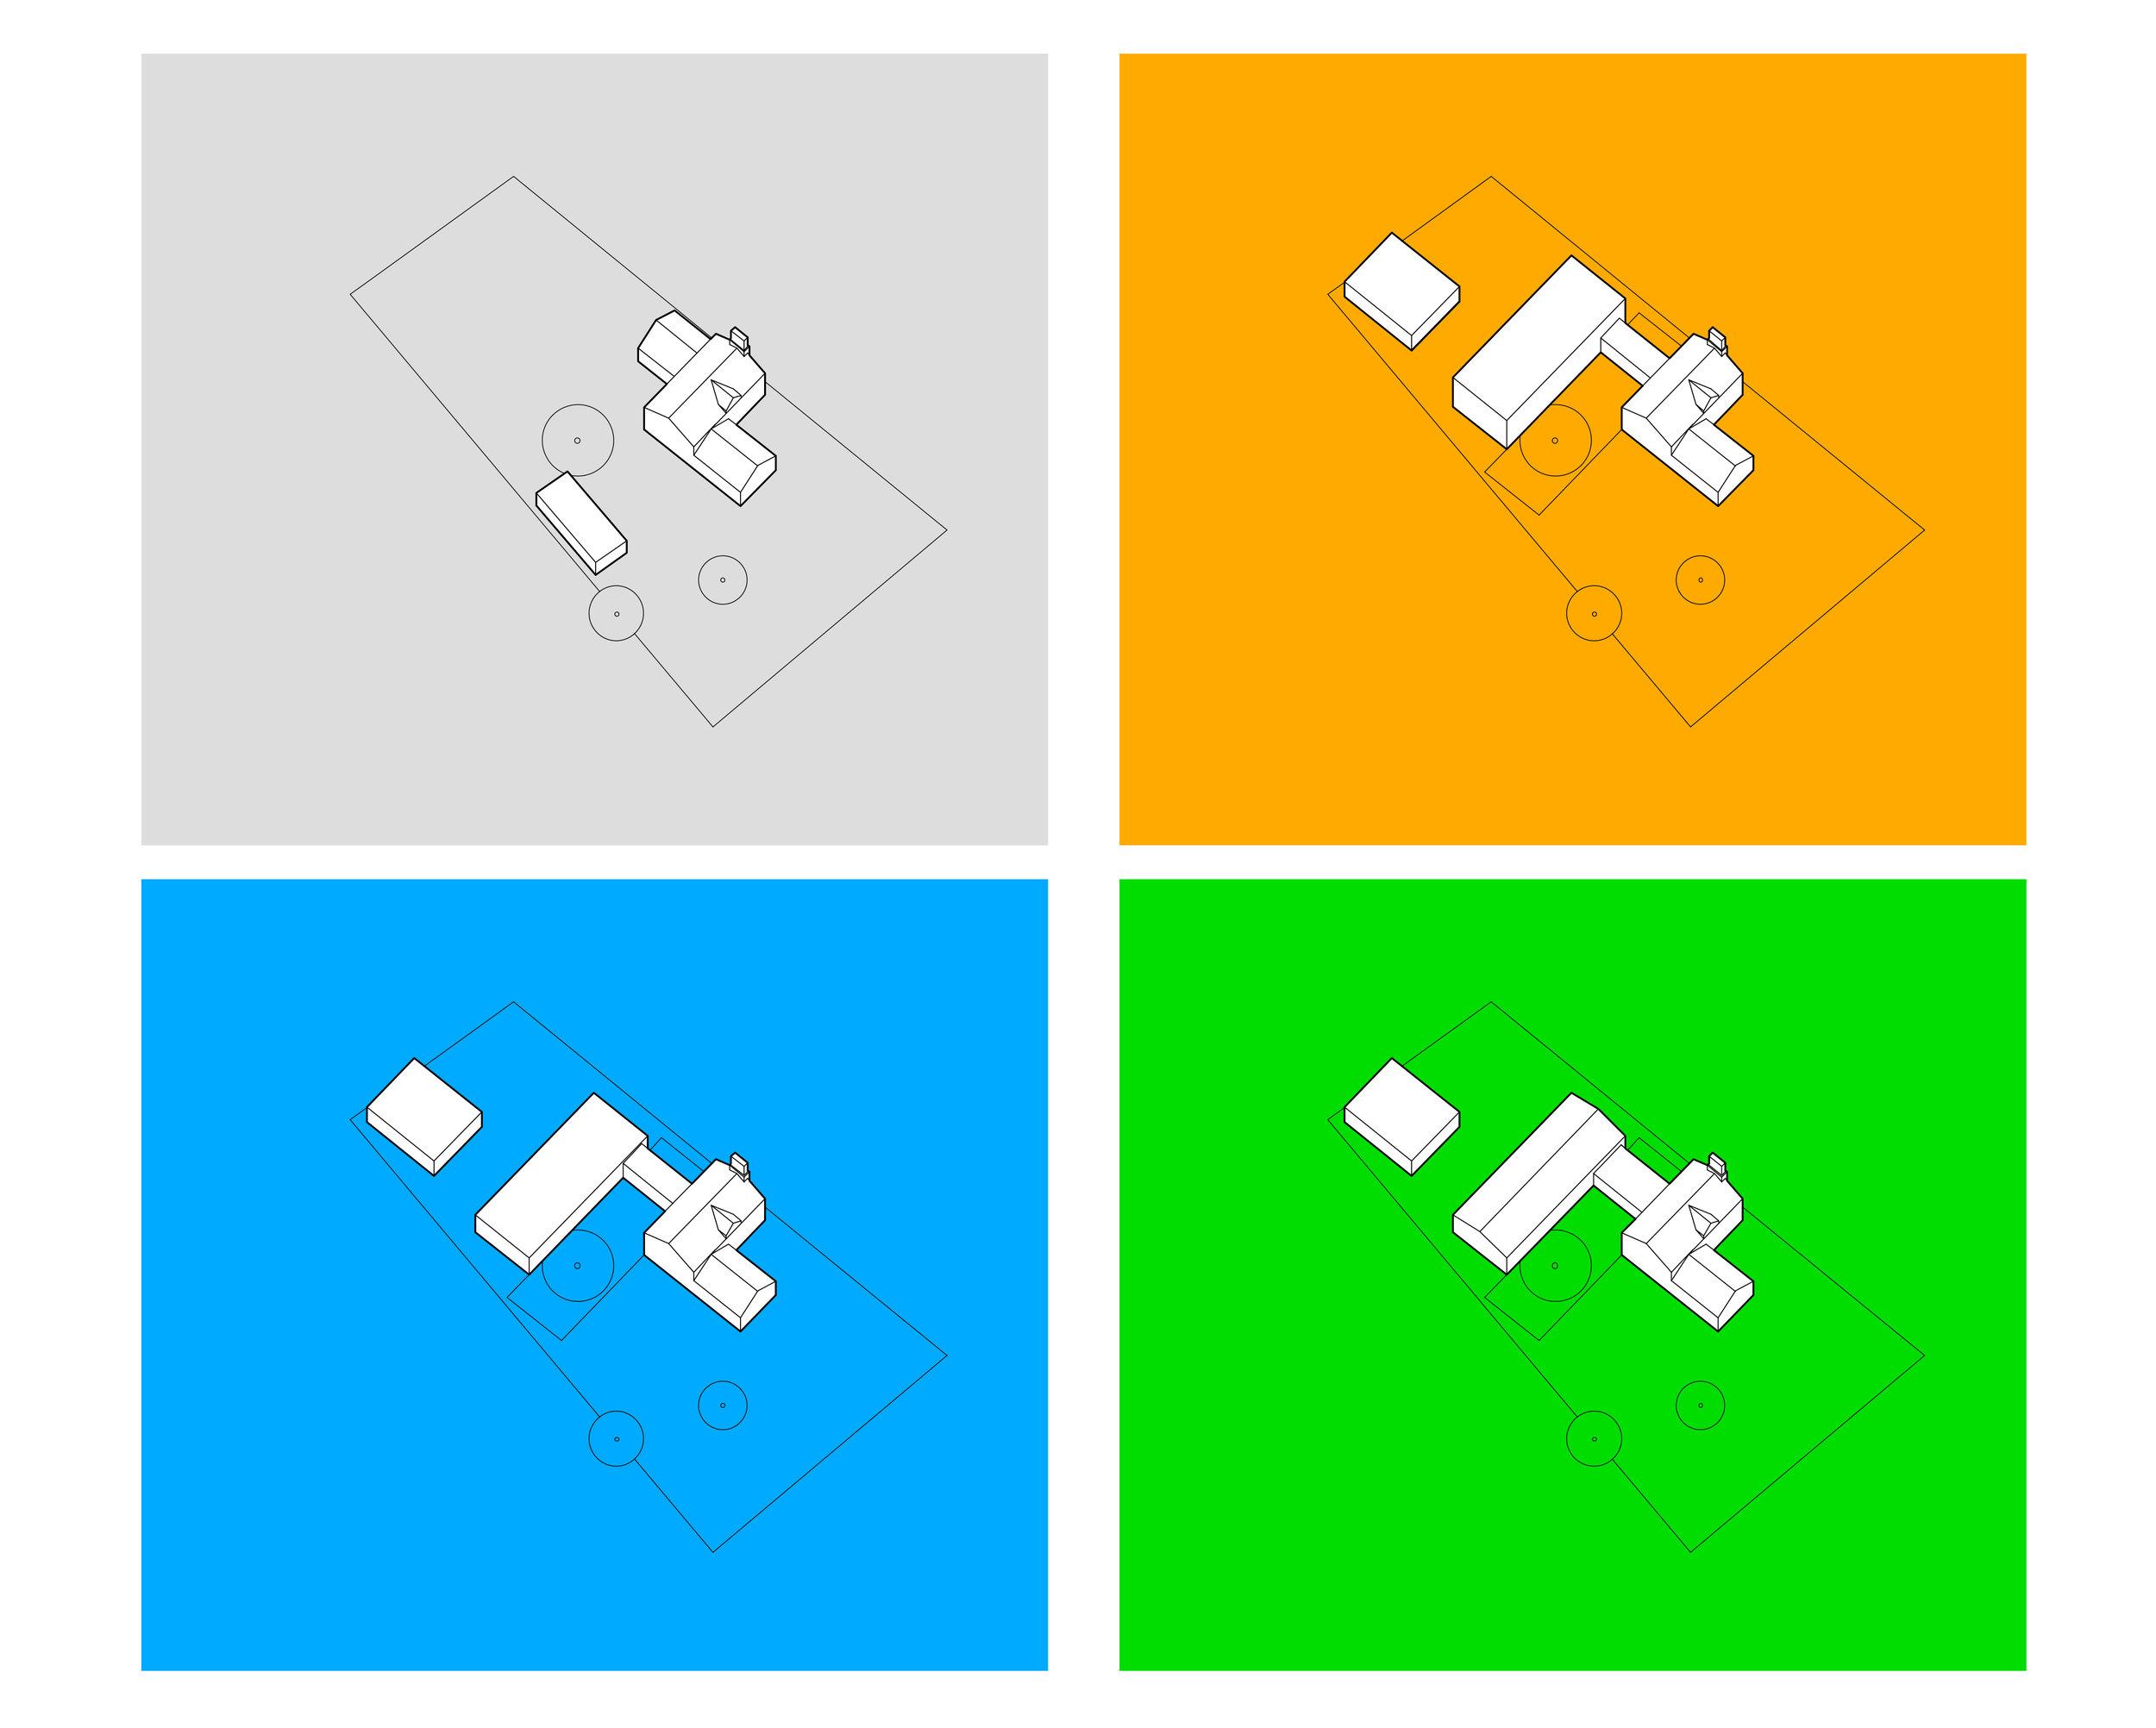 massing_2.jpg